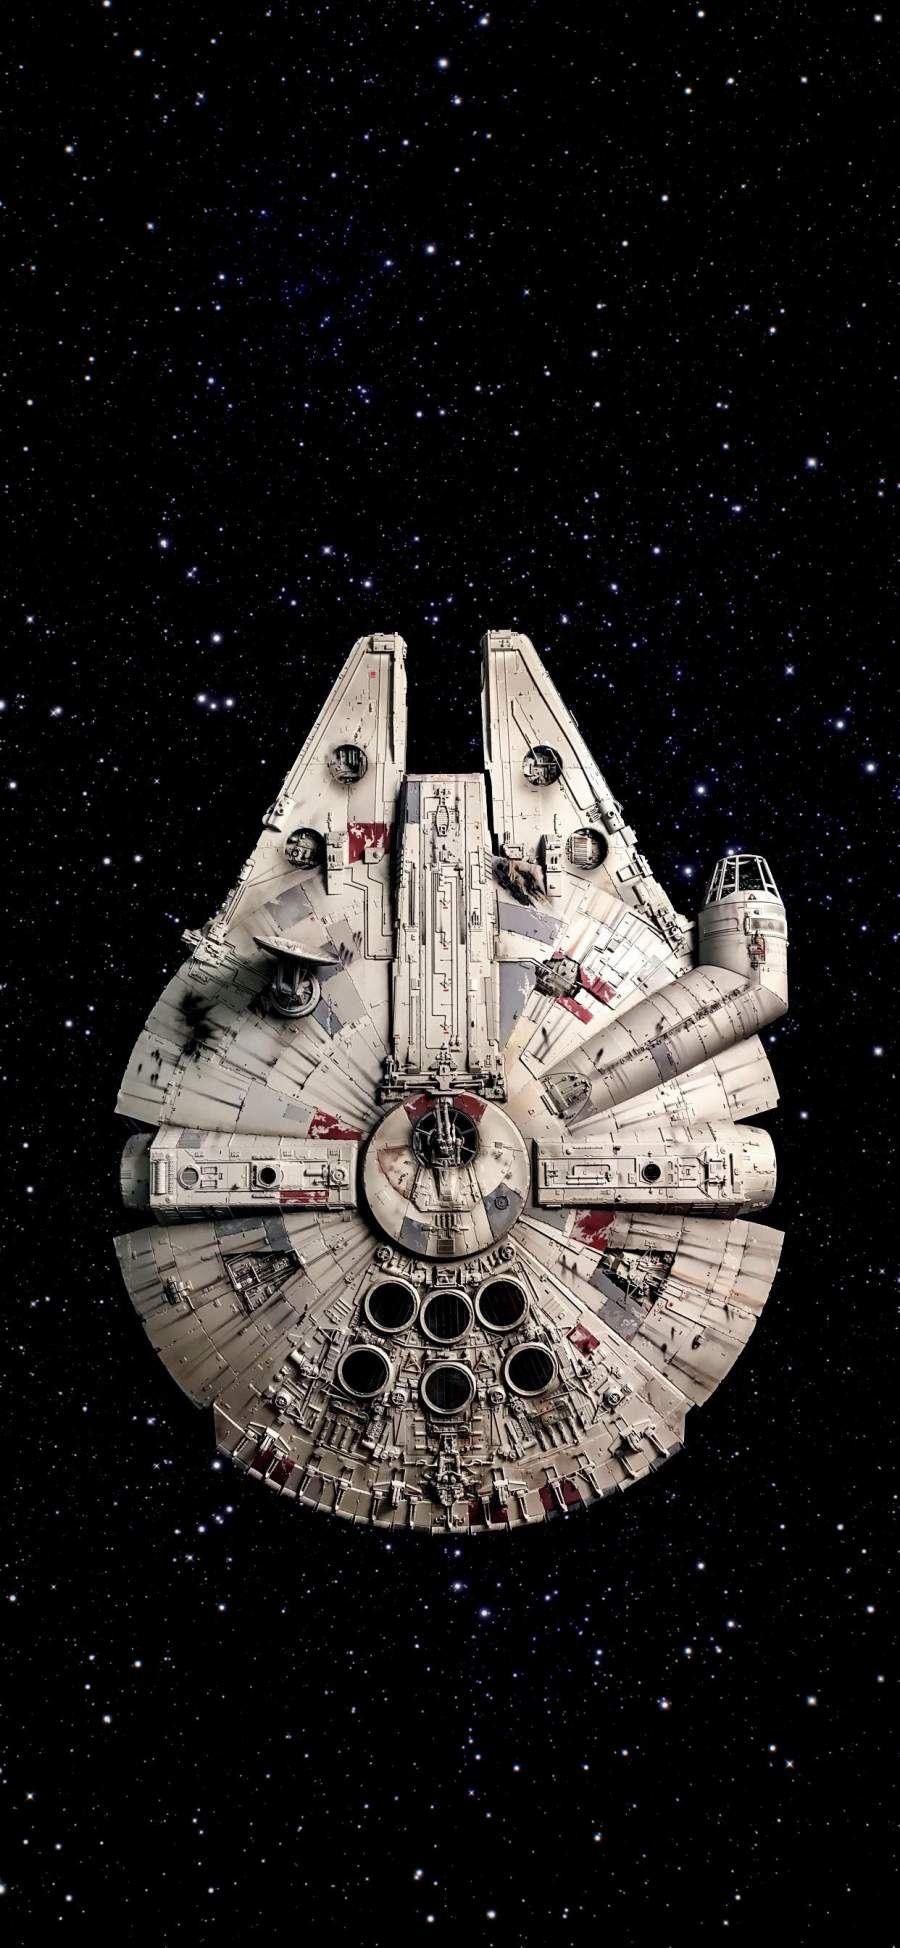 Star Wars Millennium Falcon Ship iPhone Wallpaper - iPhone Wallpapers